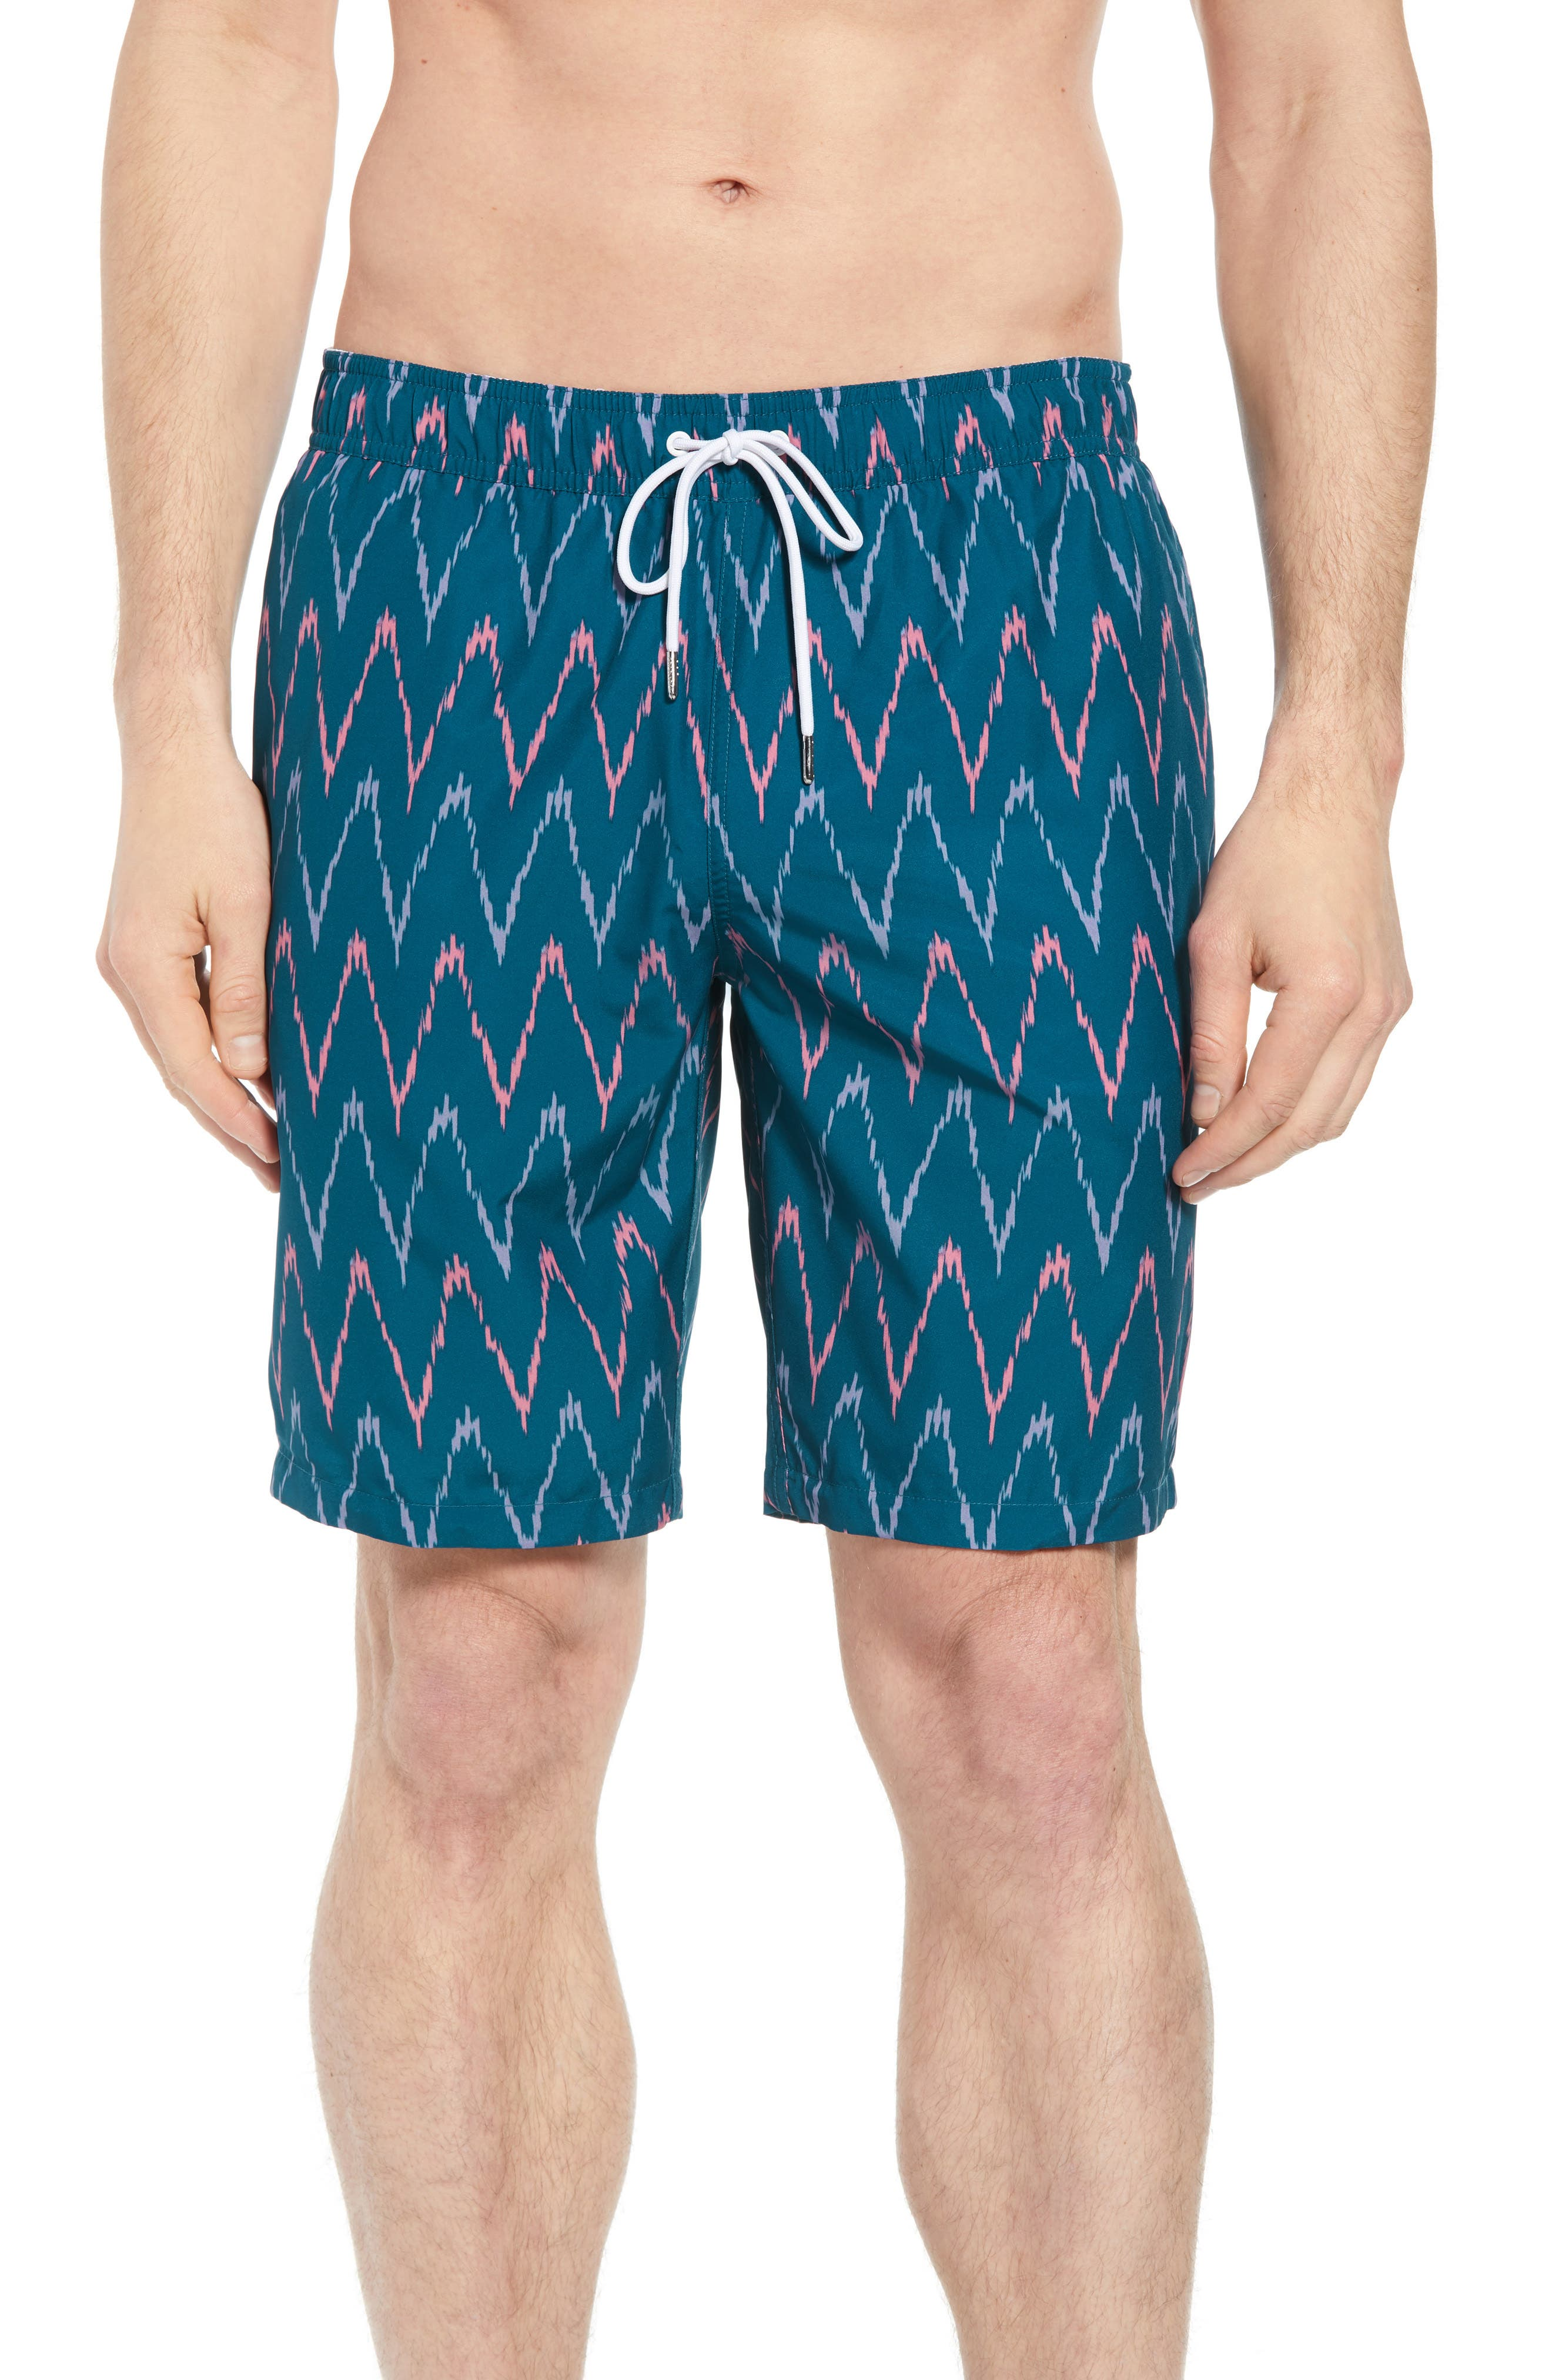 Banzai 9-Inch Swim Trunks,                         Main,                         color, 400